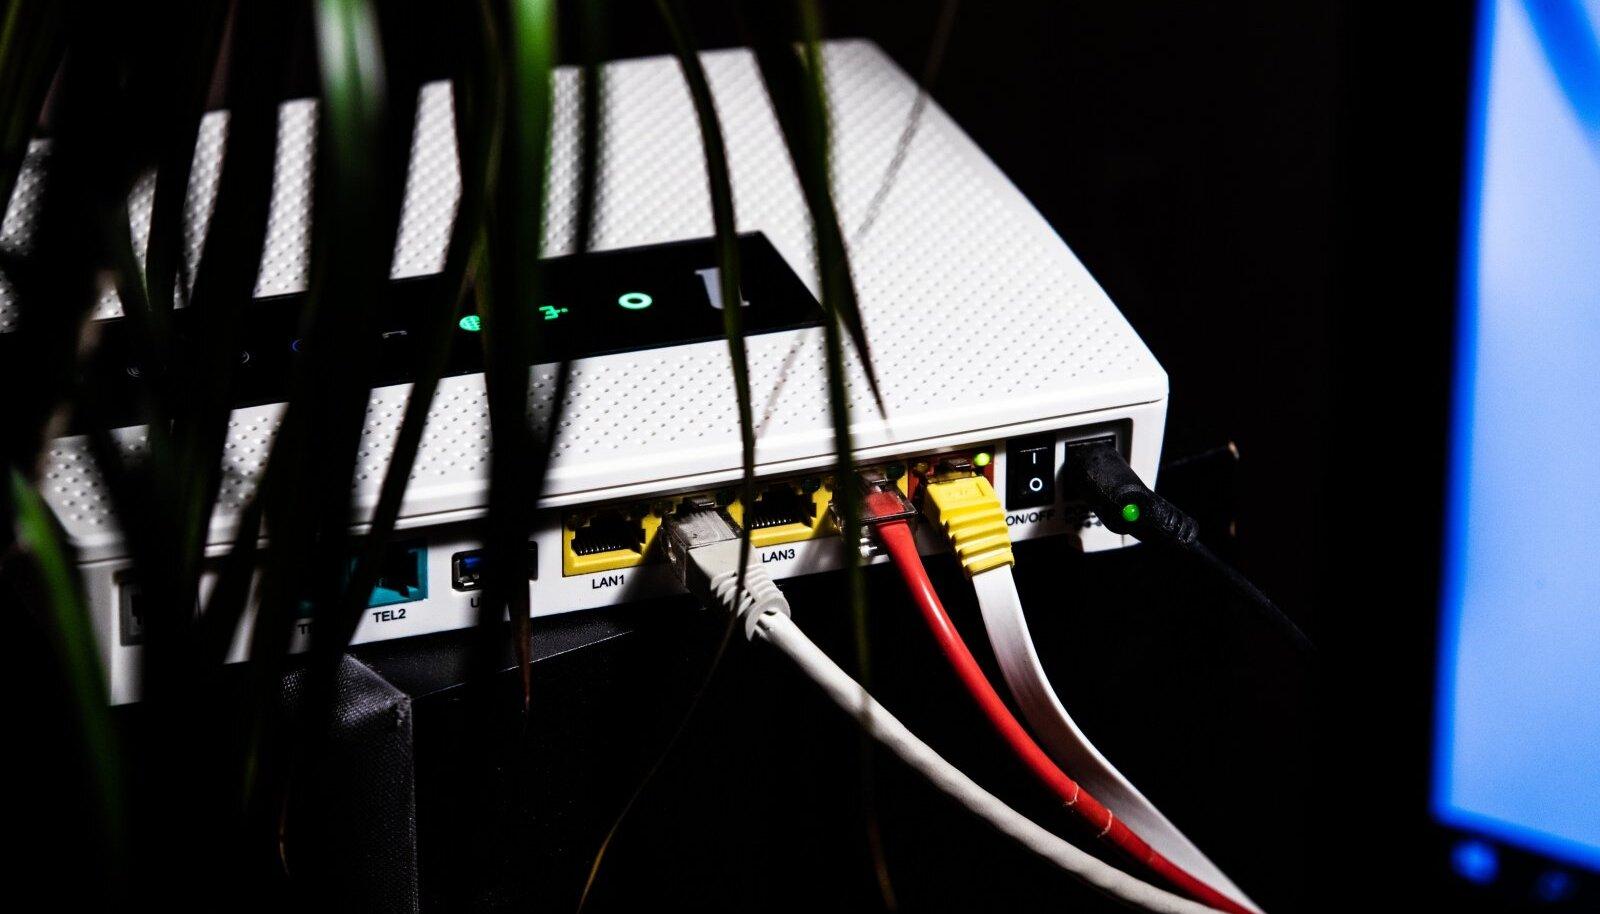 Internet kodus